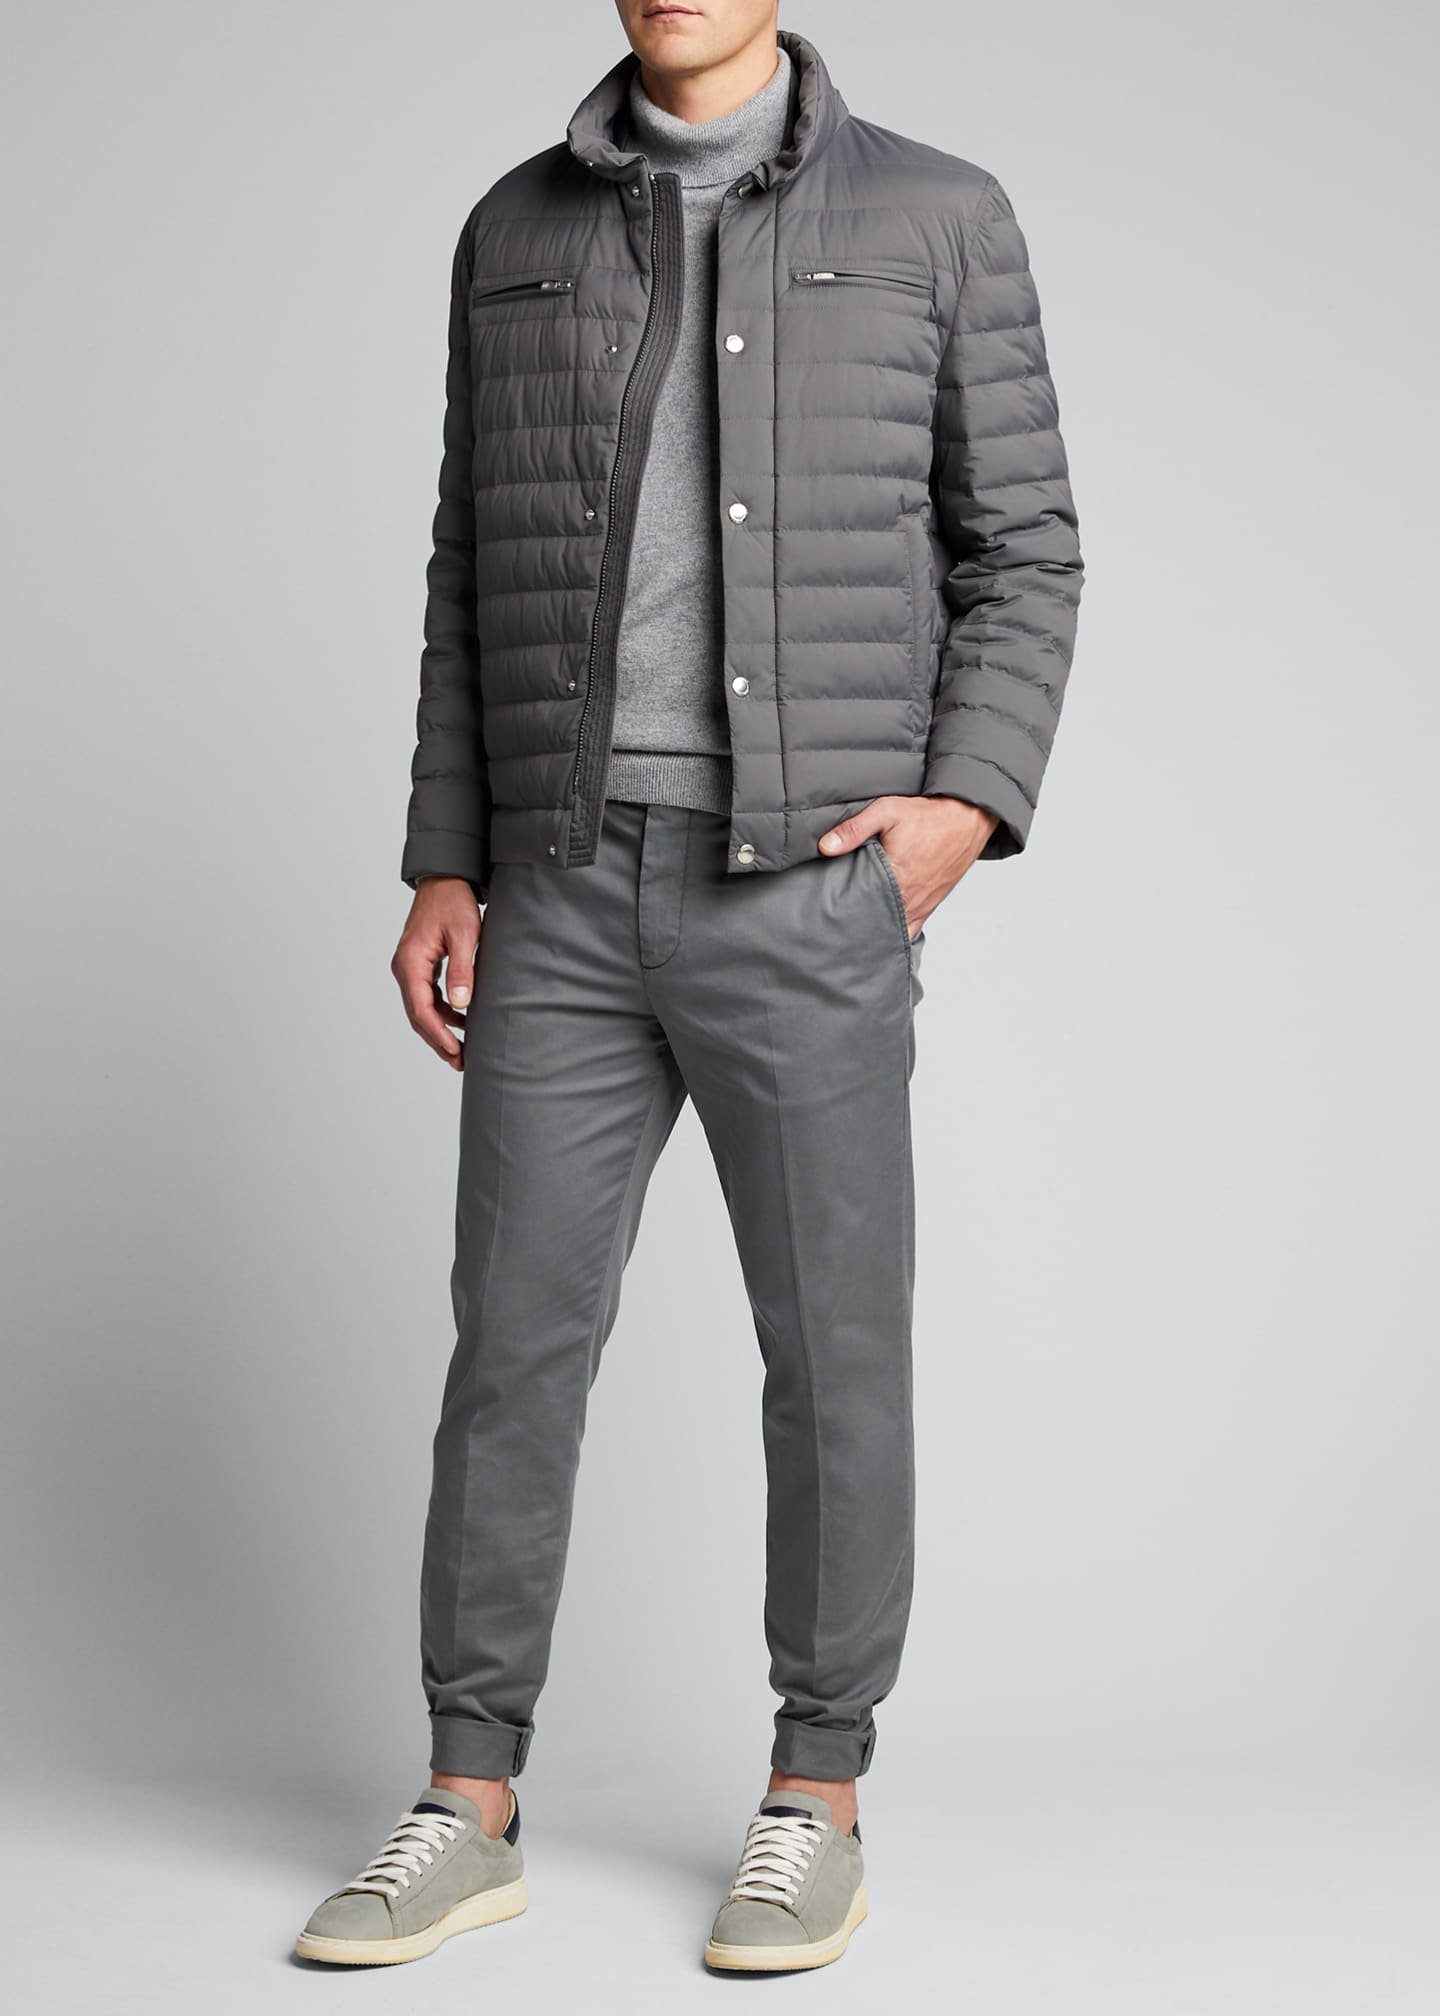 Brunello Cucinelli Men's Basic Fit Chino Pants